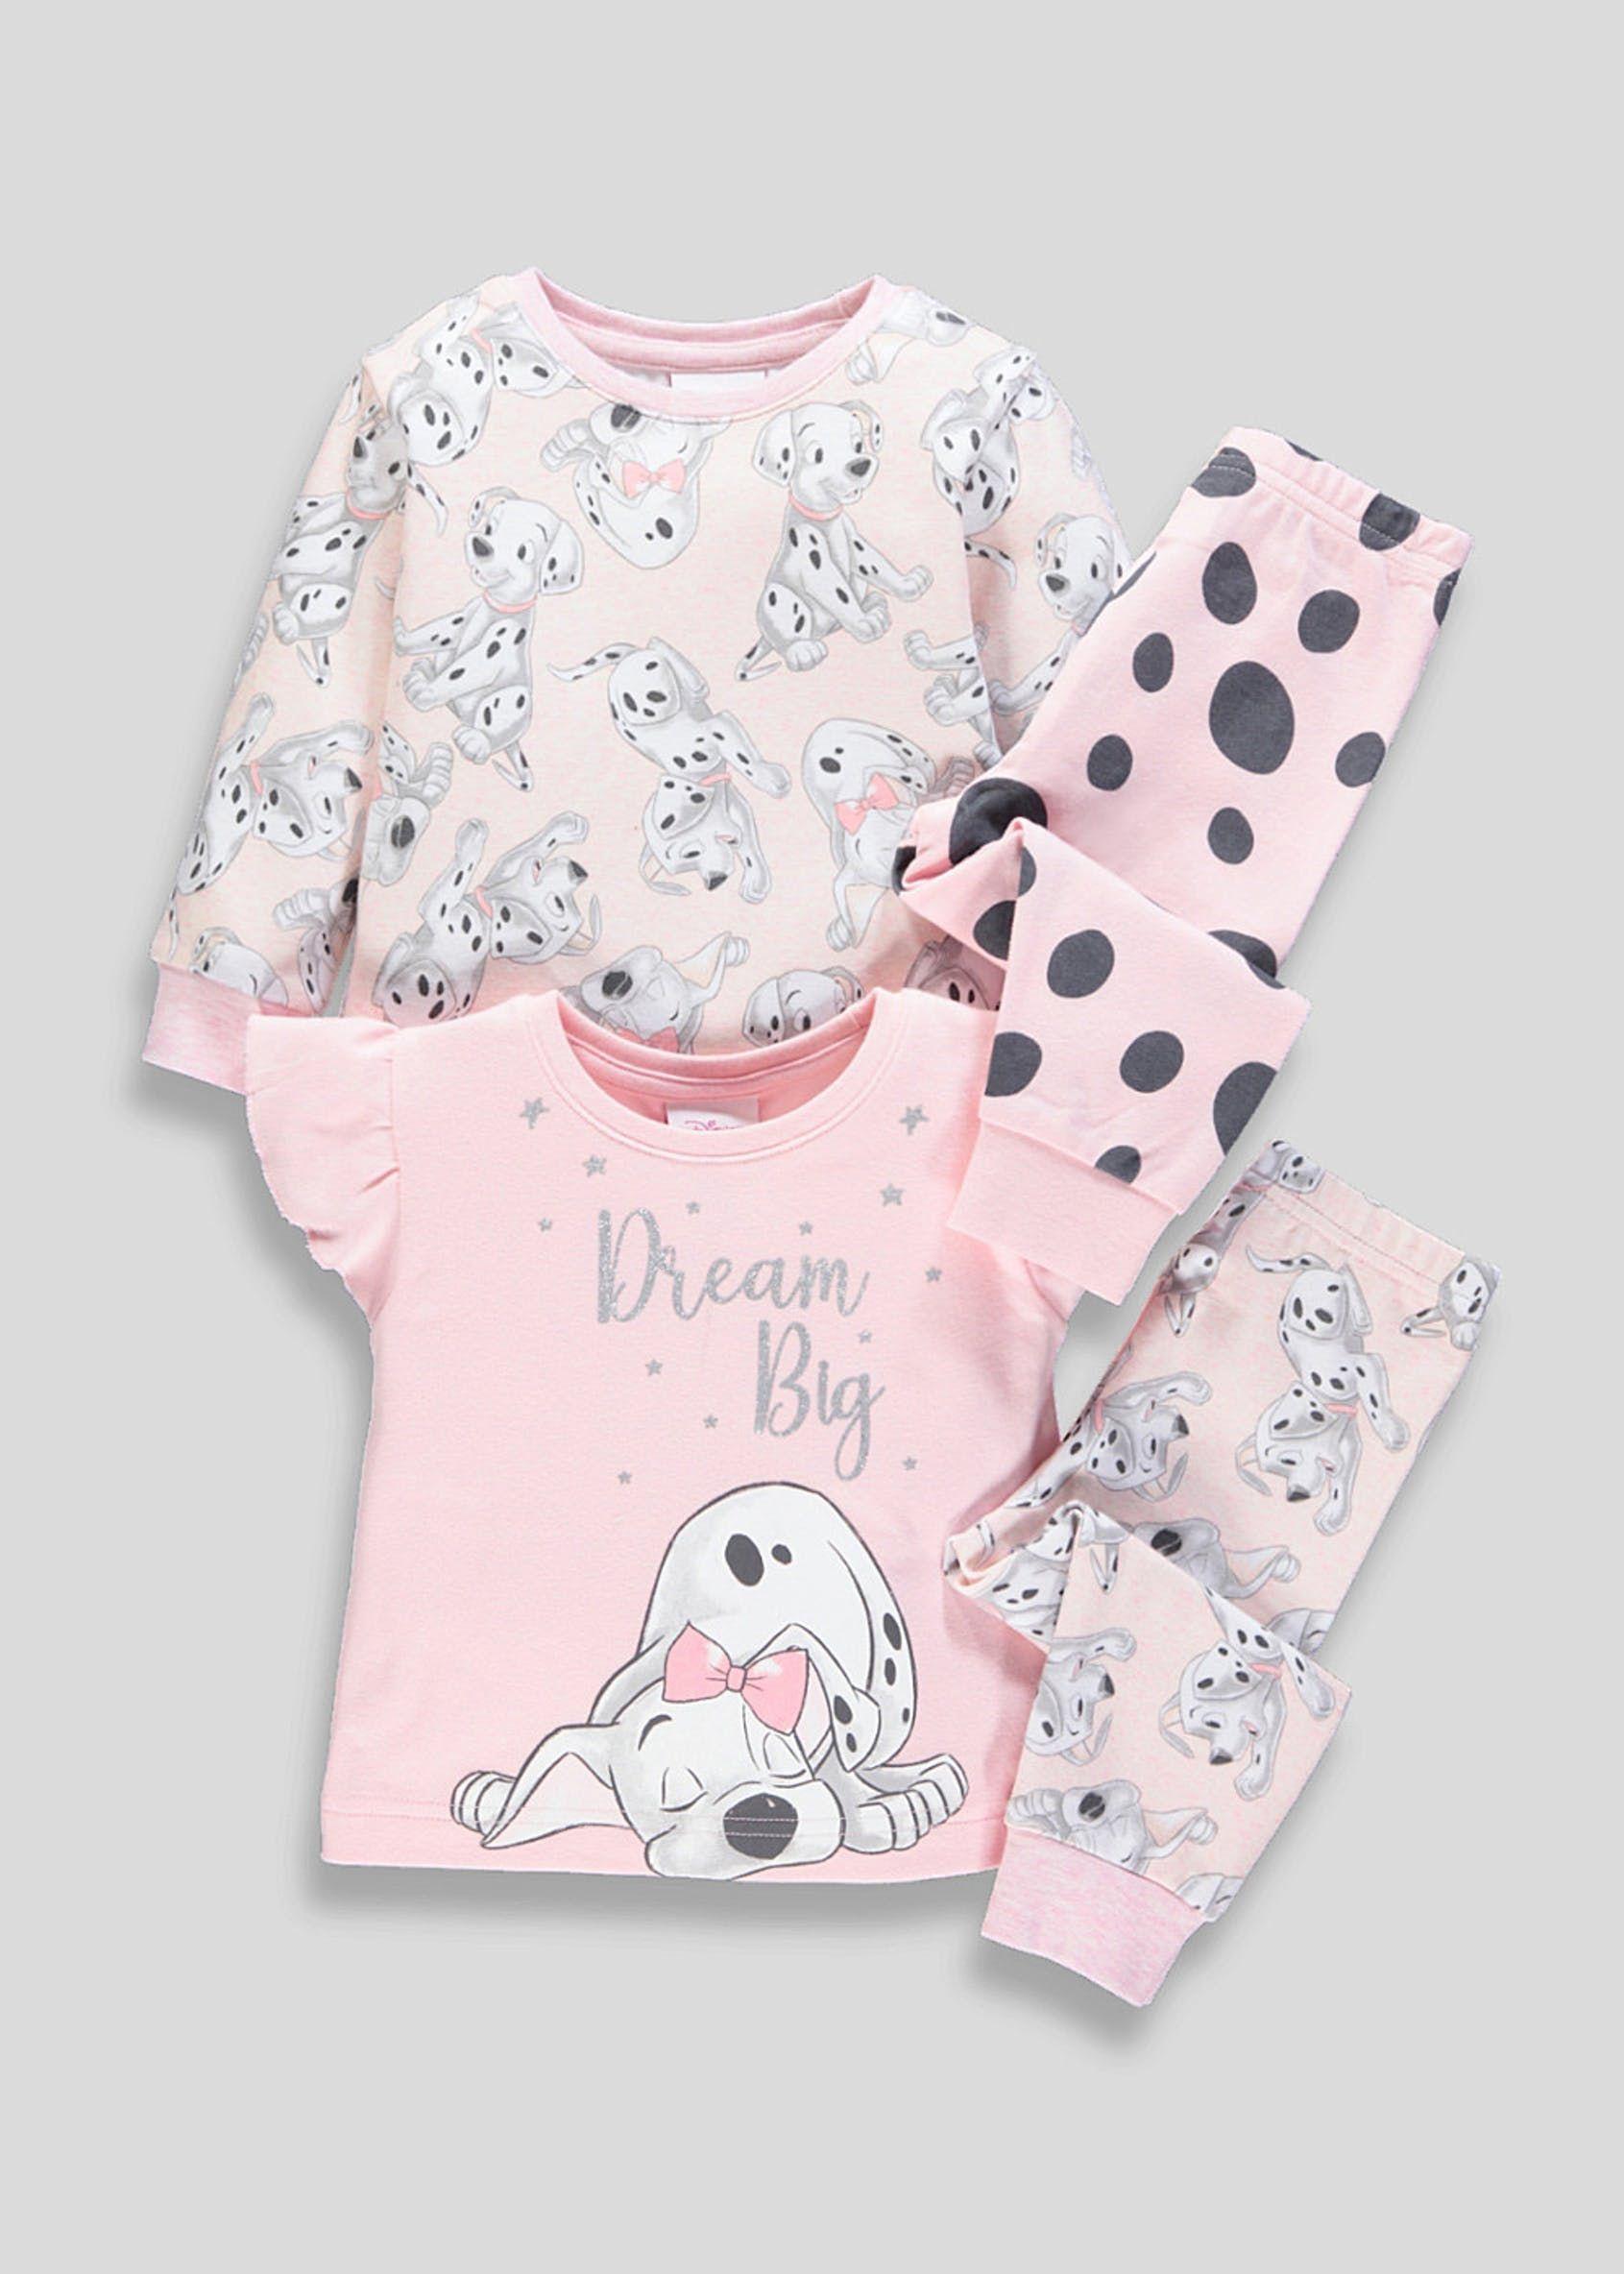 Kids 2 Pack Disney 101 Dalmatians Pyjamas 3mths 6yrs Pink Pyjamas Dalmatian Kids